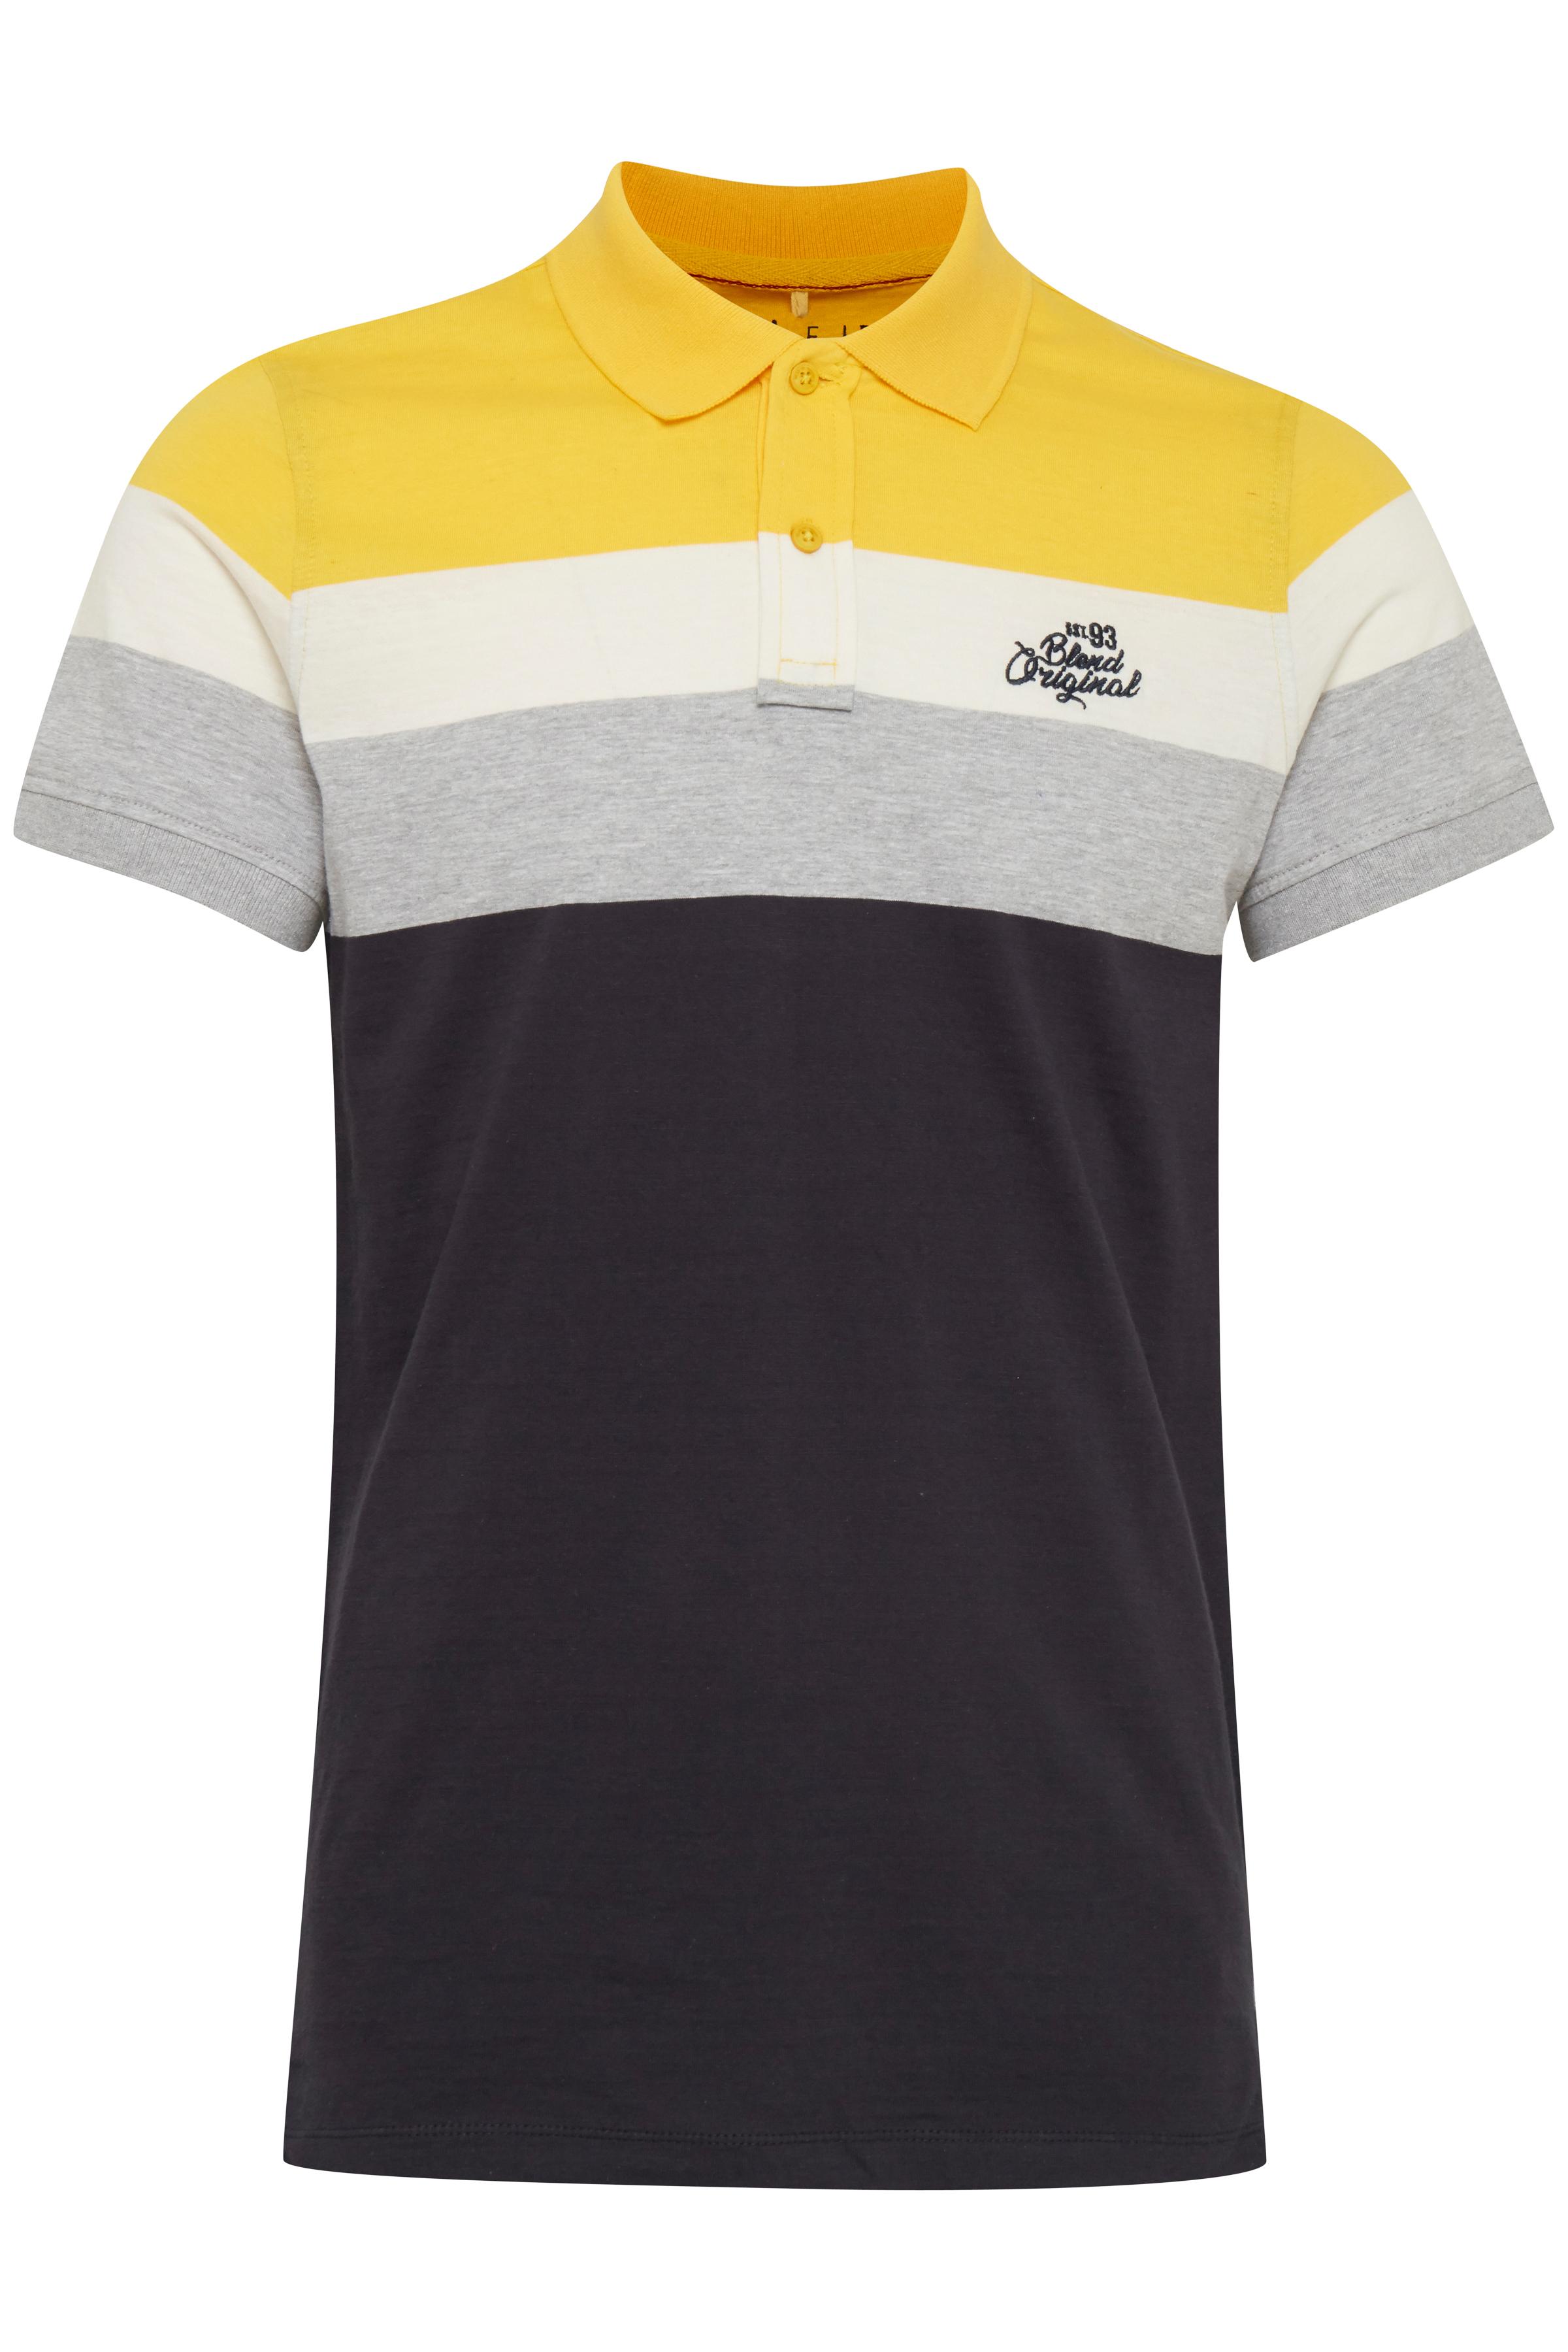 Freesia Yellow T-shirt – Køb Freesia Yellow T-shirt fra str. S-XXL her